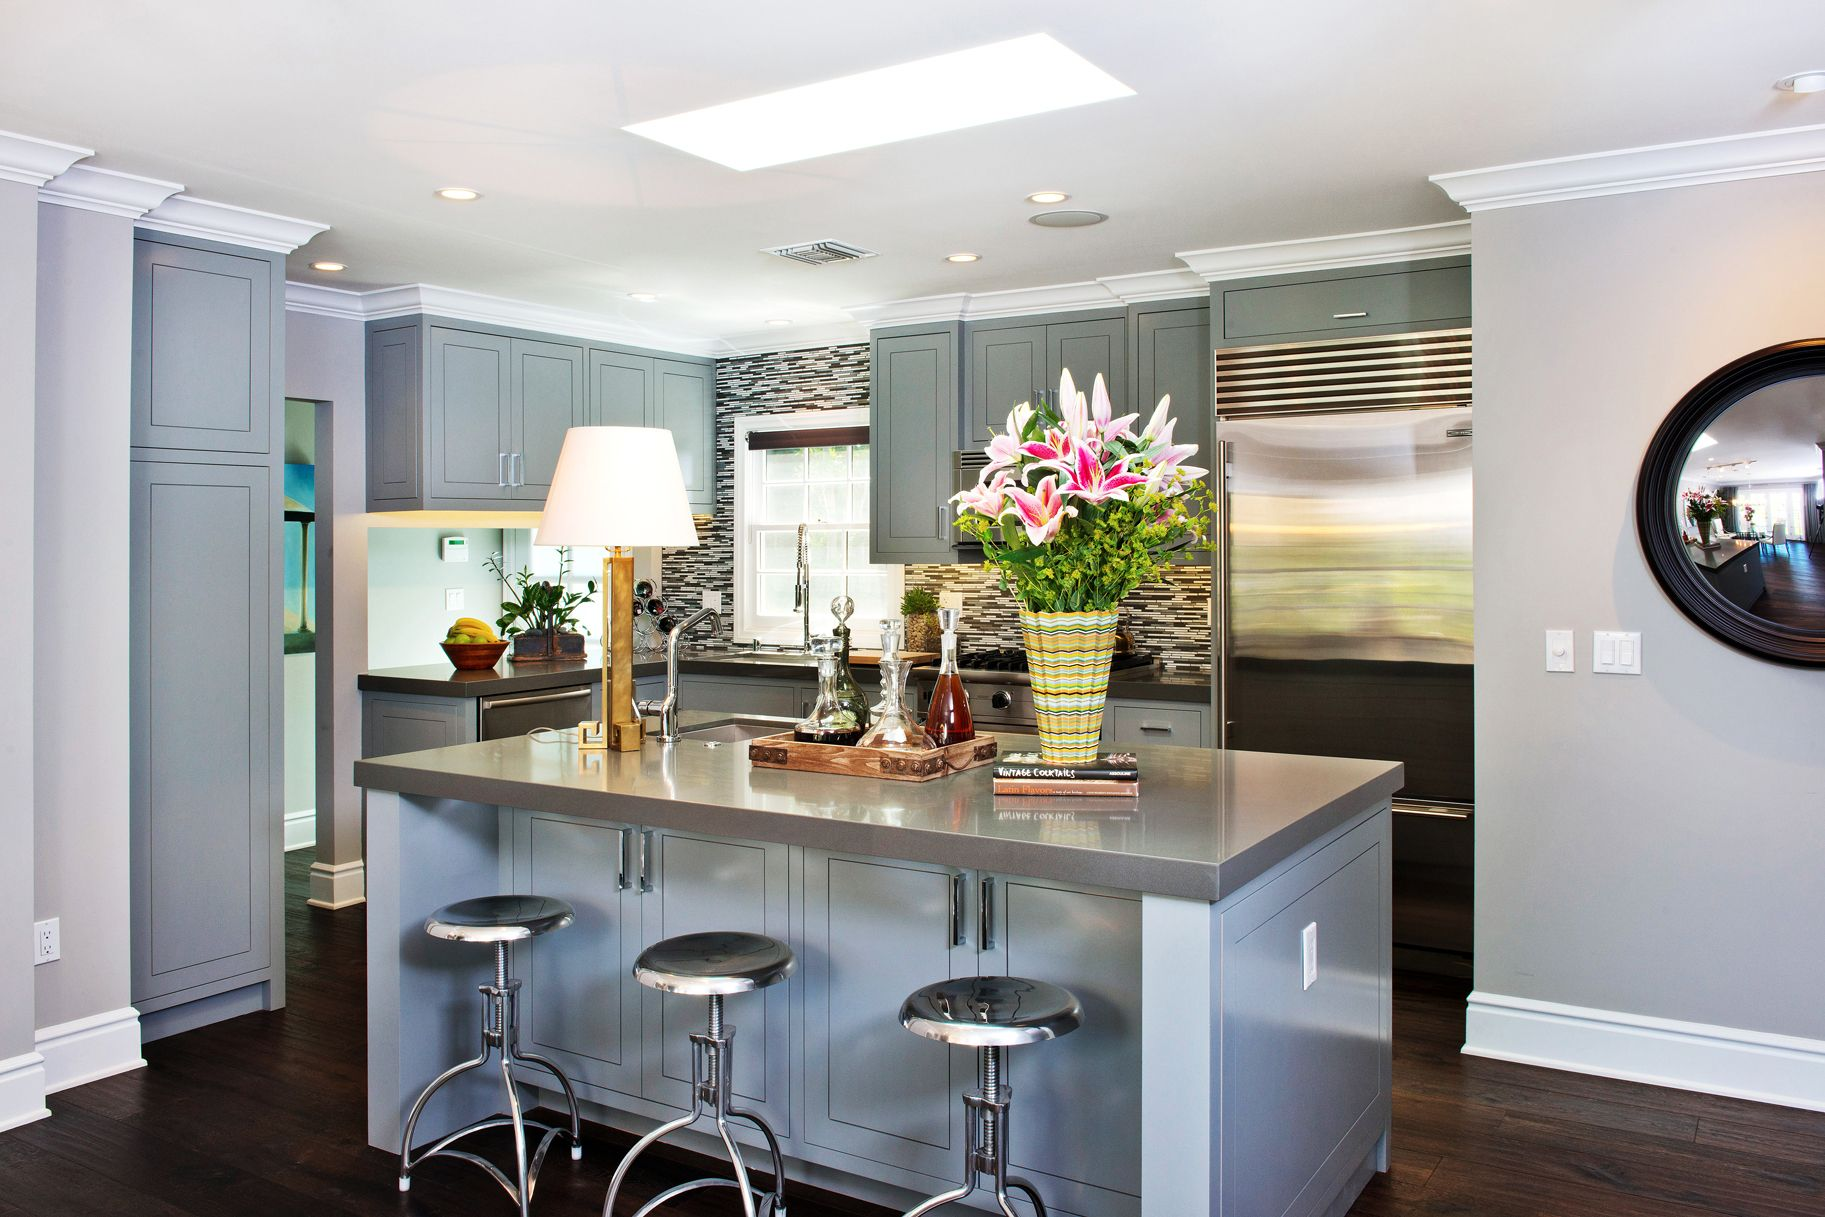 Jeff Lewis Kitchen Design Amusing Jeff Redoes Spring Oak  Before And After  Bravo Tv Jeff Lewis Decorating Design